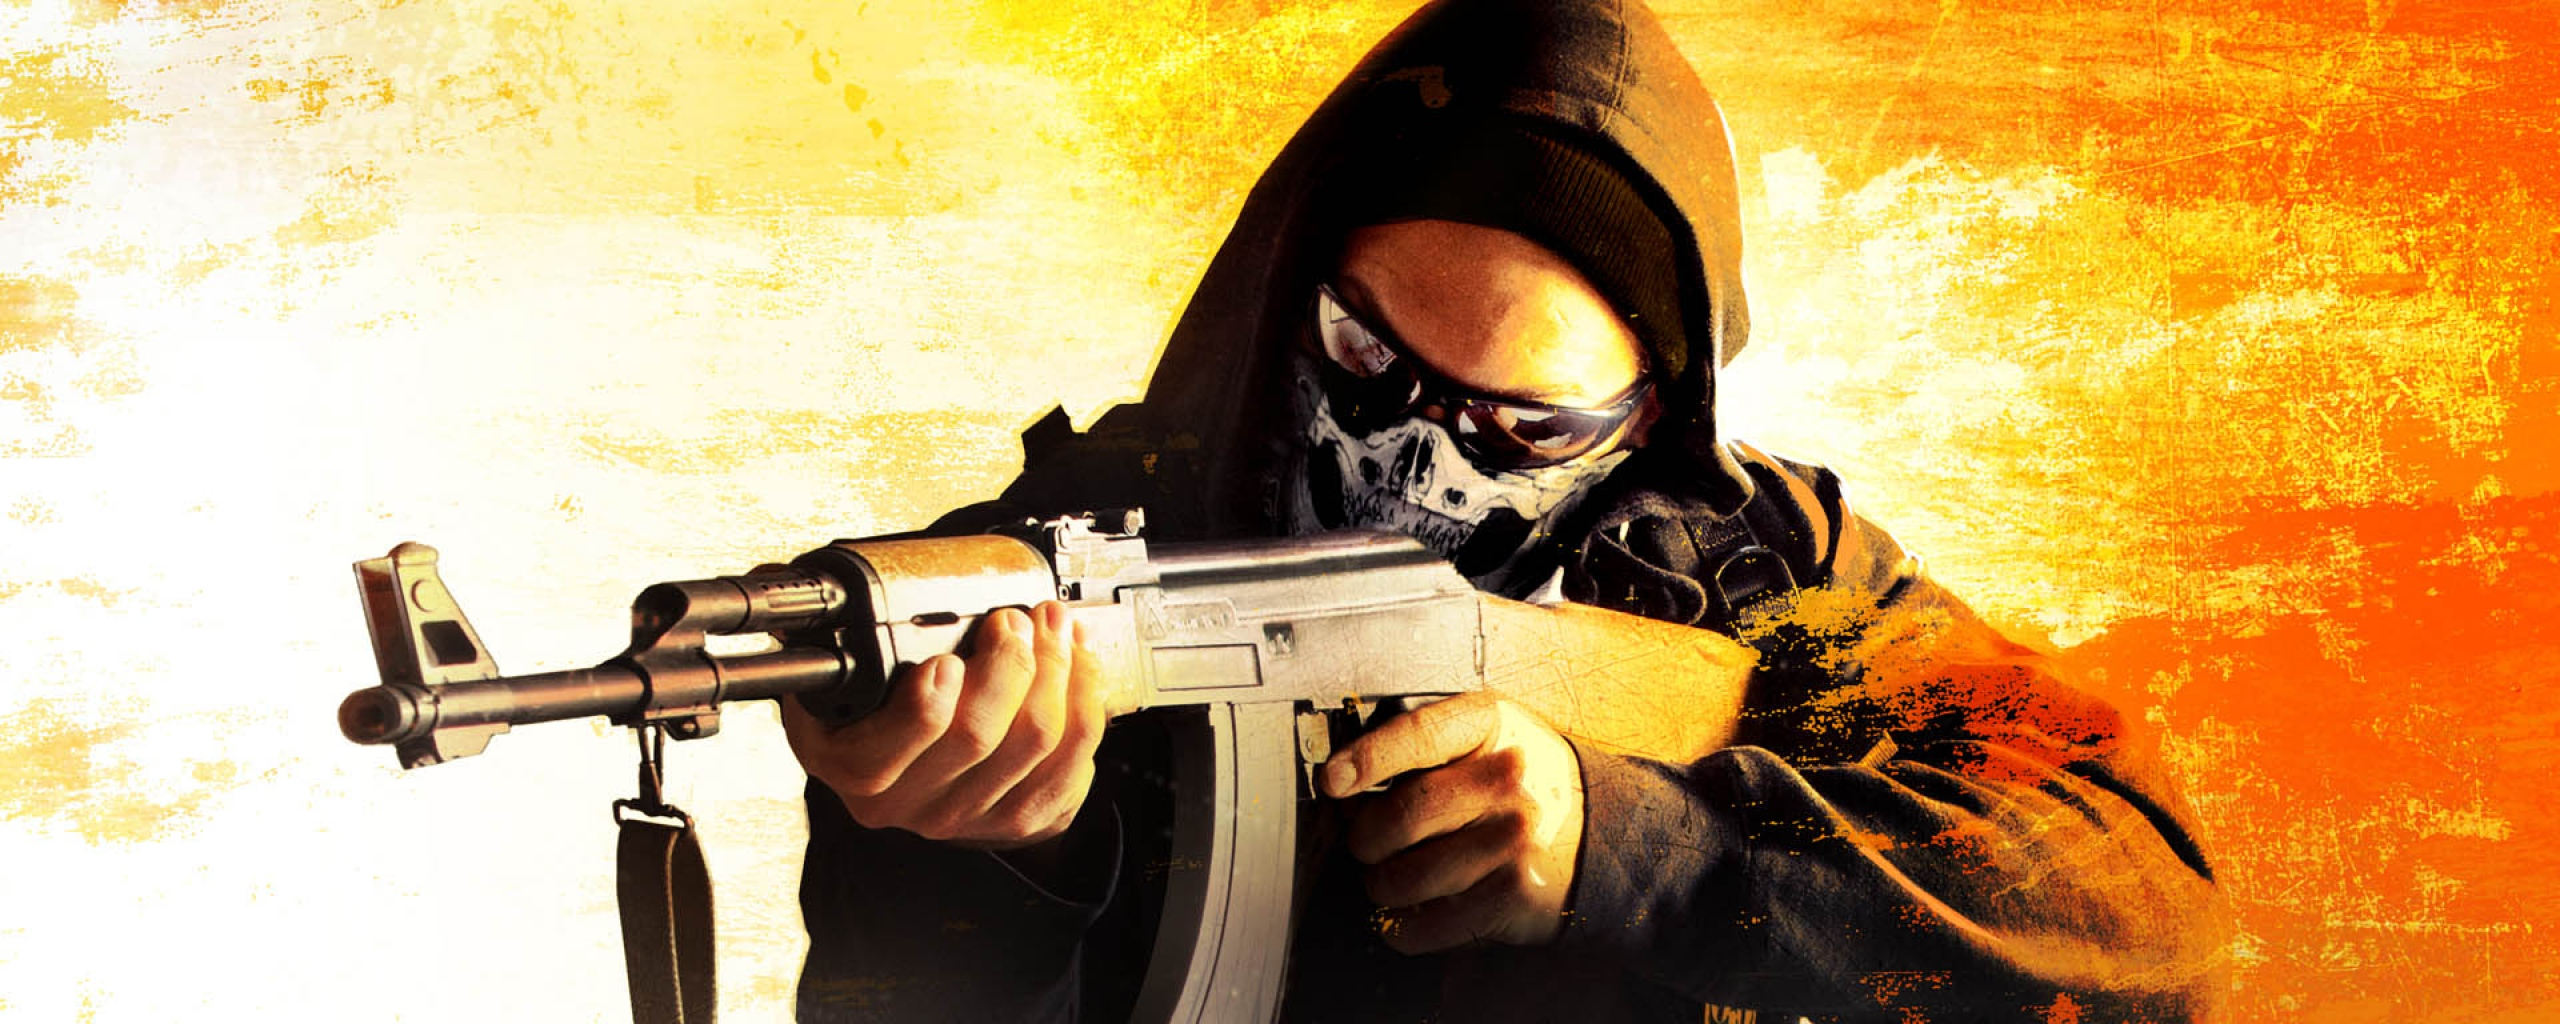 counter strike global offensive art anarchist game card steam cs go 2560x1024